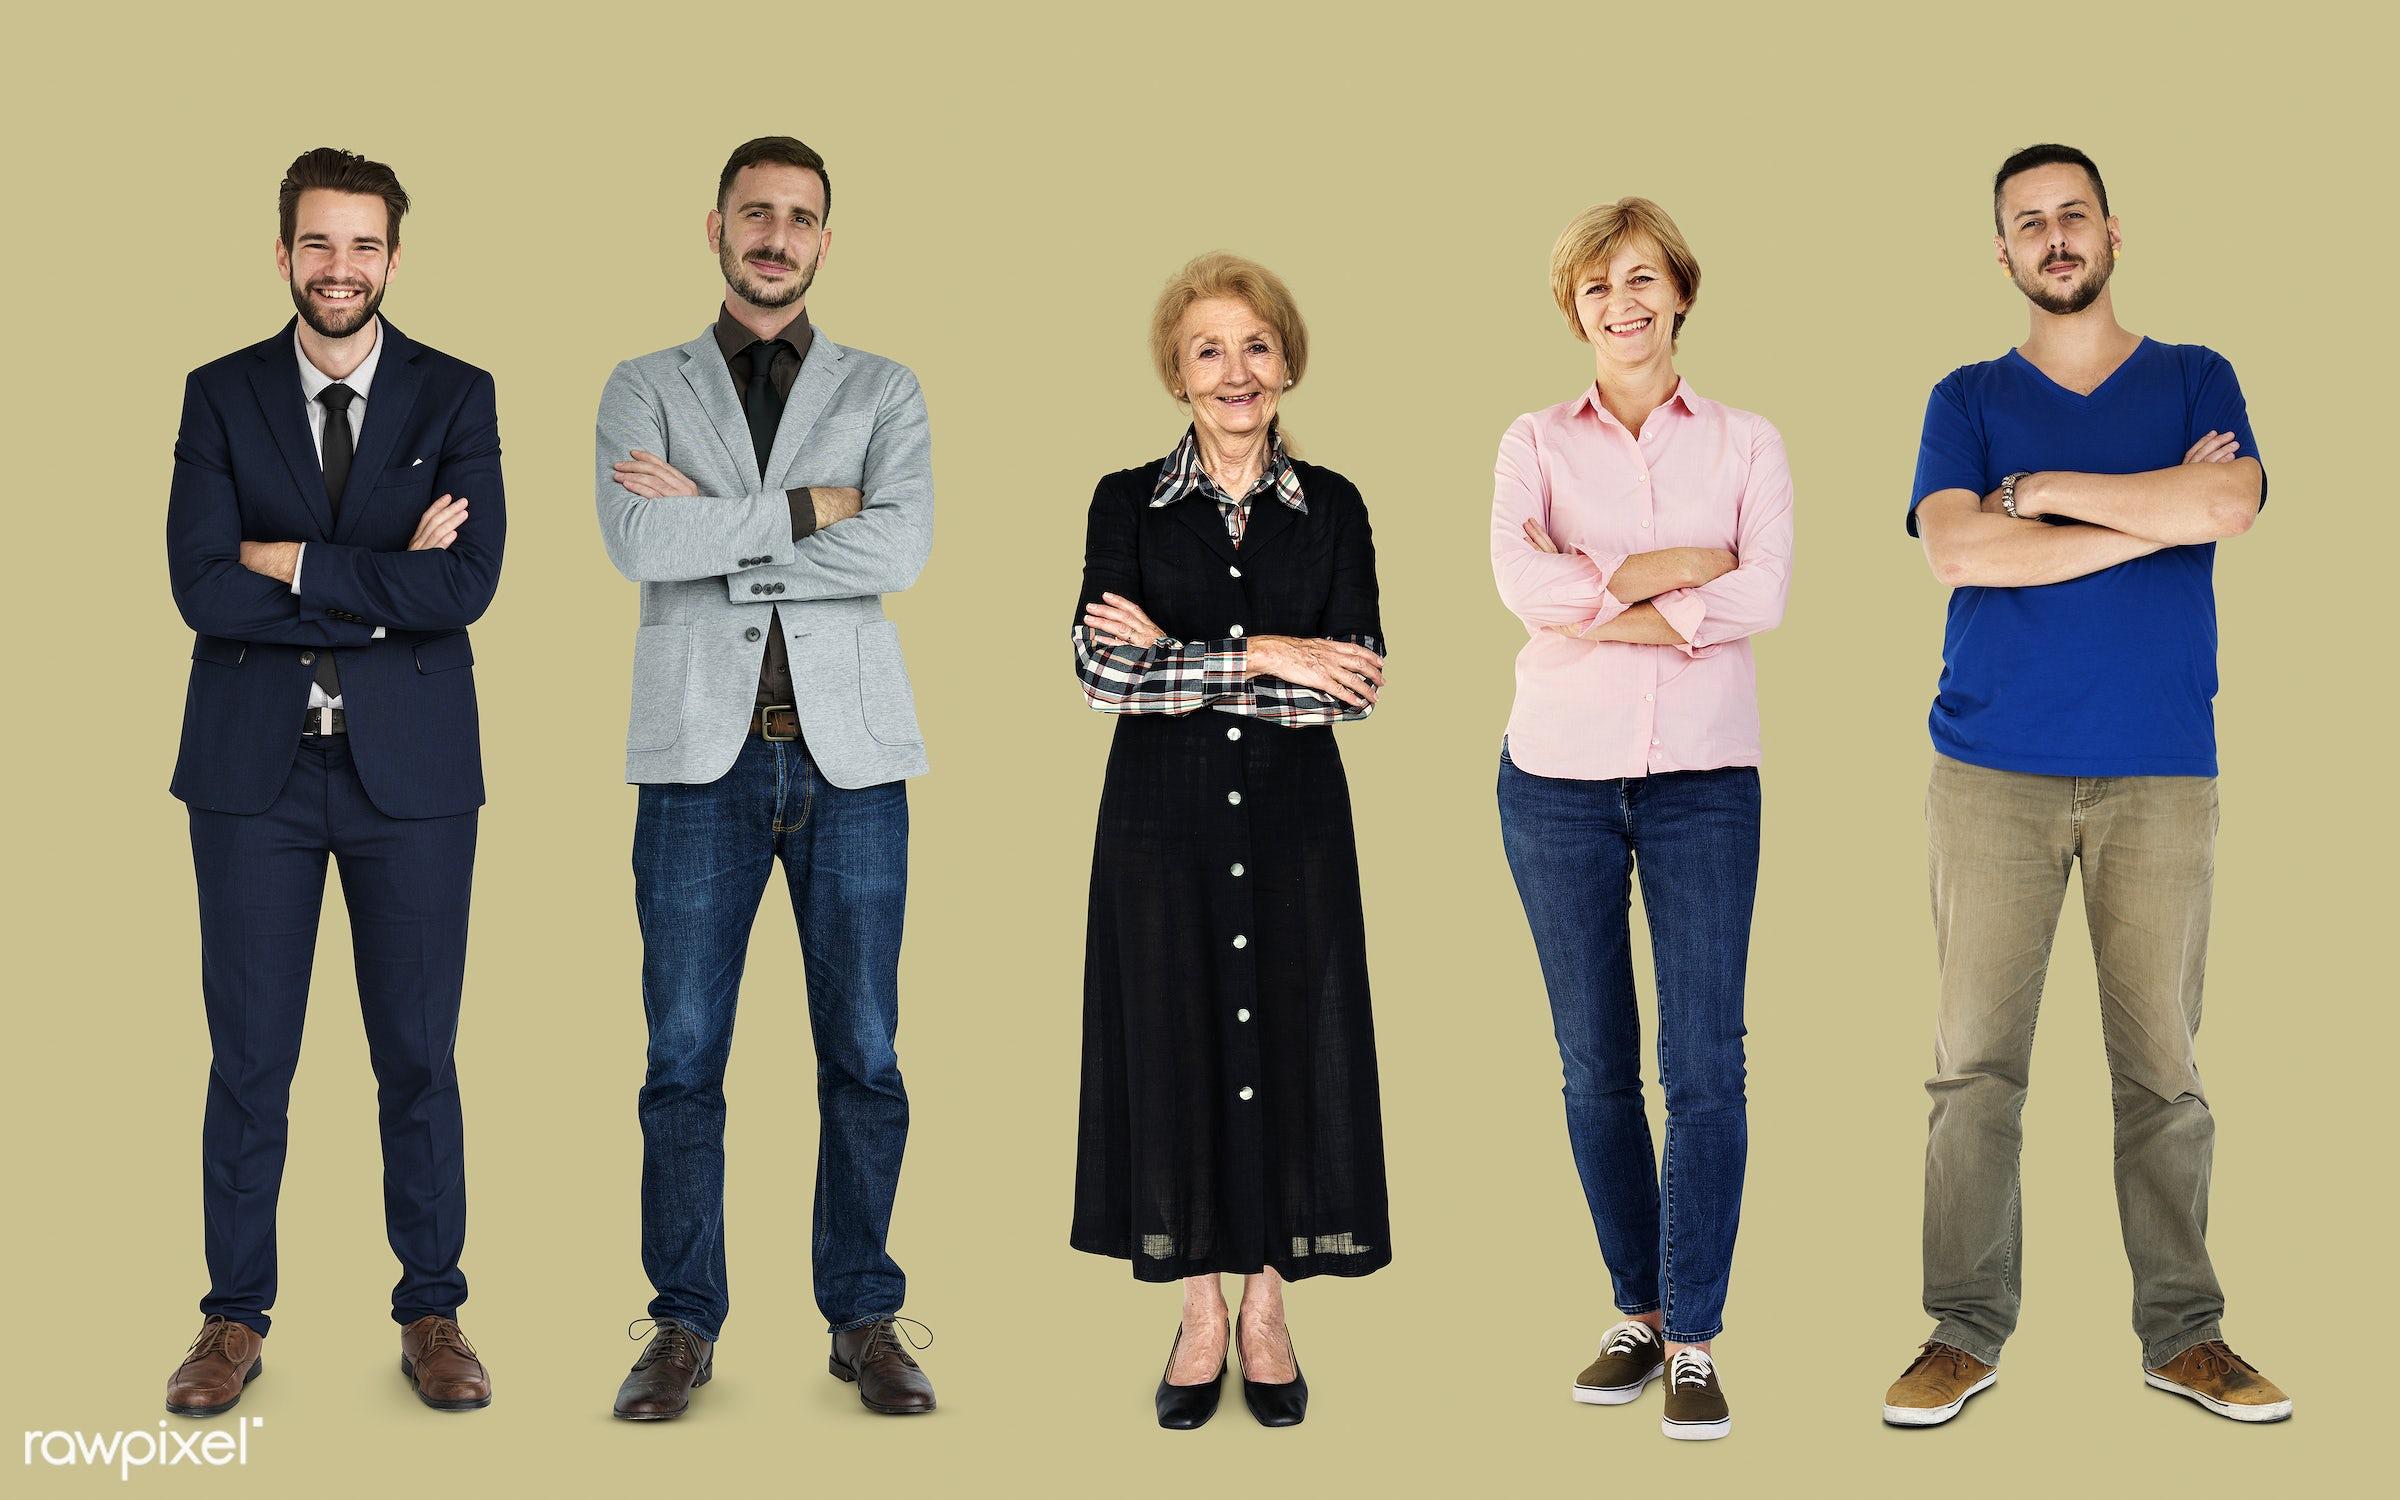 gentlemen, studio, person, diverse, set, retired, retire, people, attraction, together, caucasian, retirement, life, woman,...